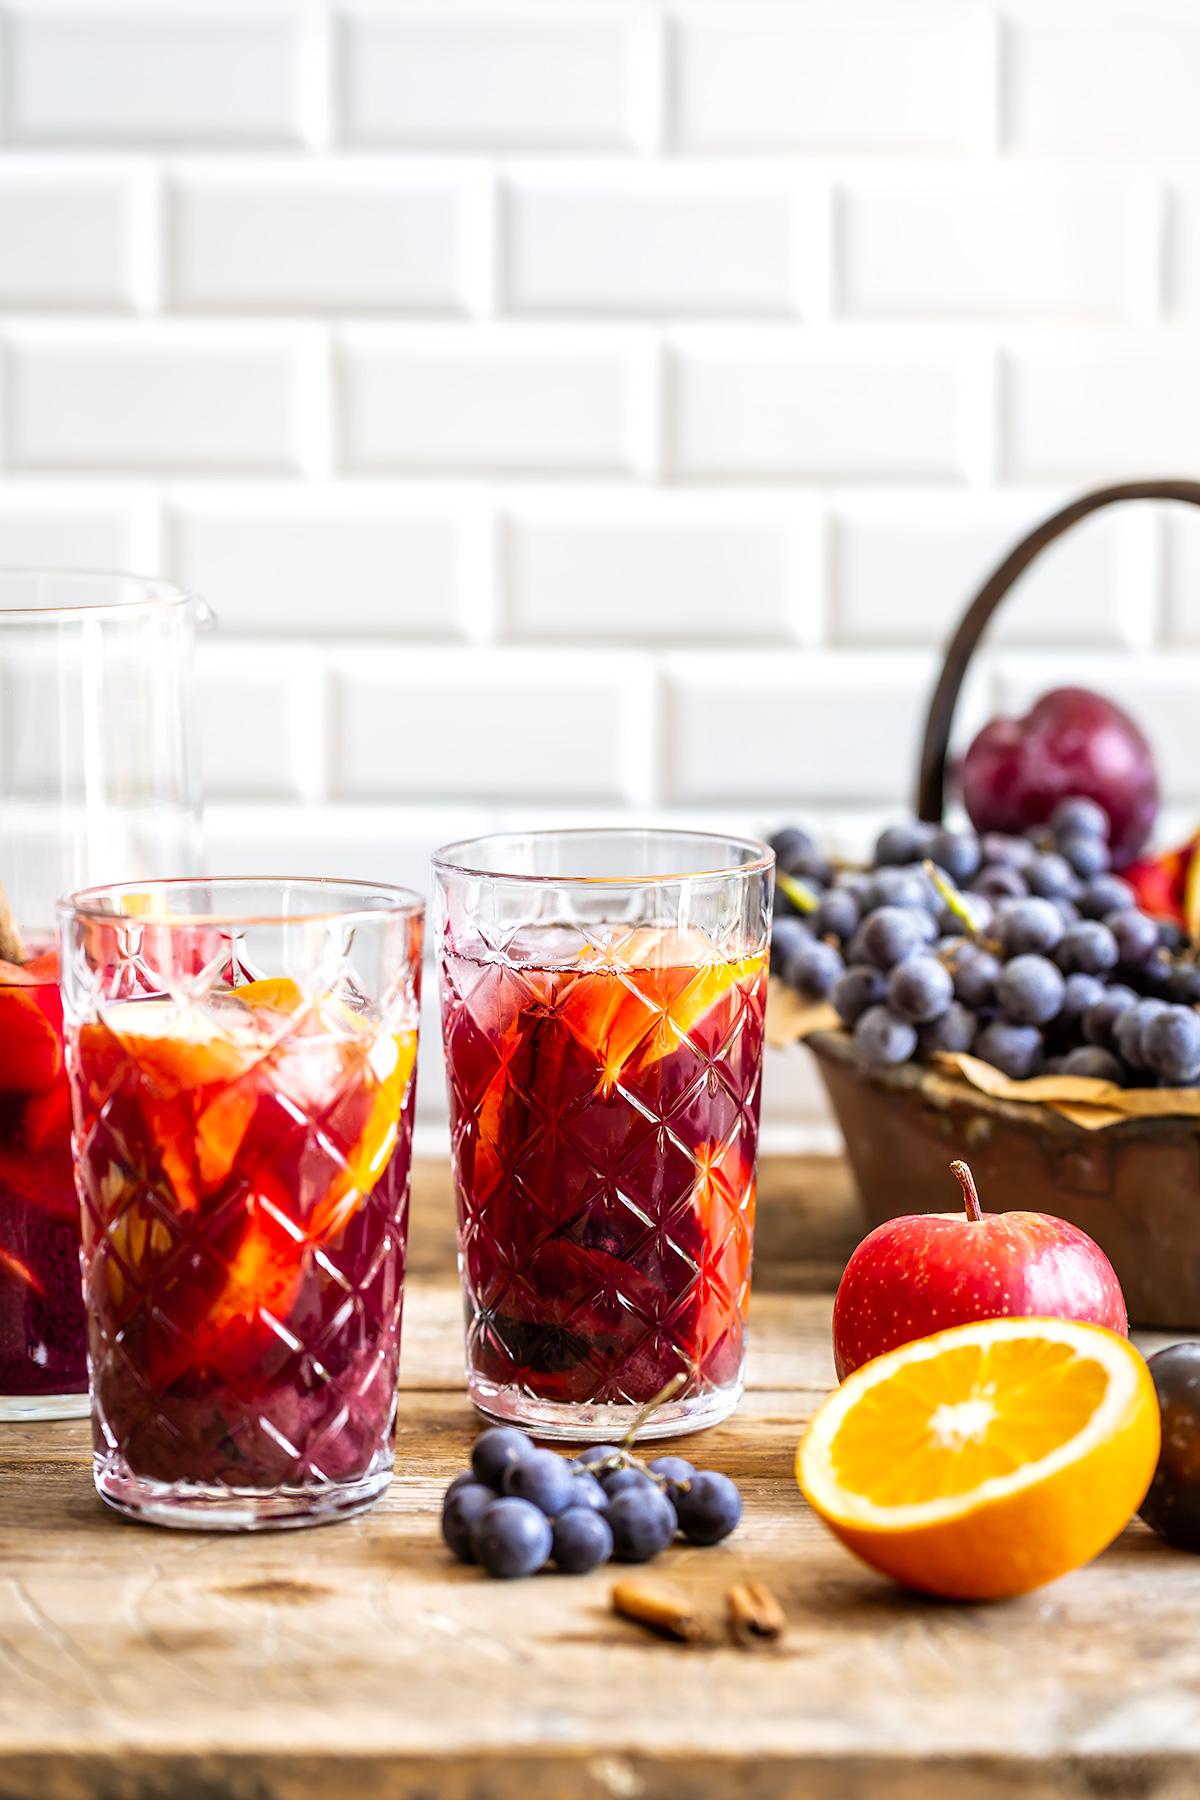 ricetta SANGRIA analcolica al KOMBUCHA facile Simple non alcoholic kombucha SANGRIA recipe #vegan